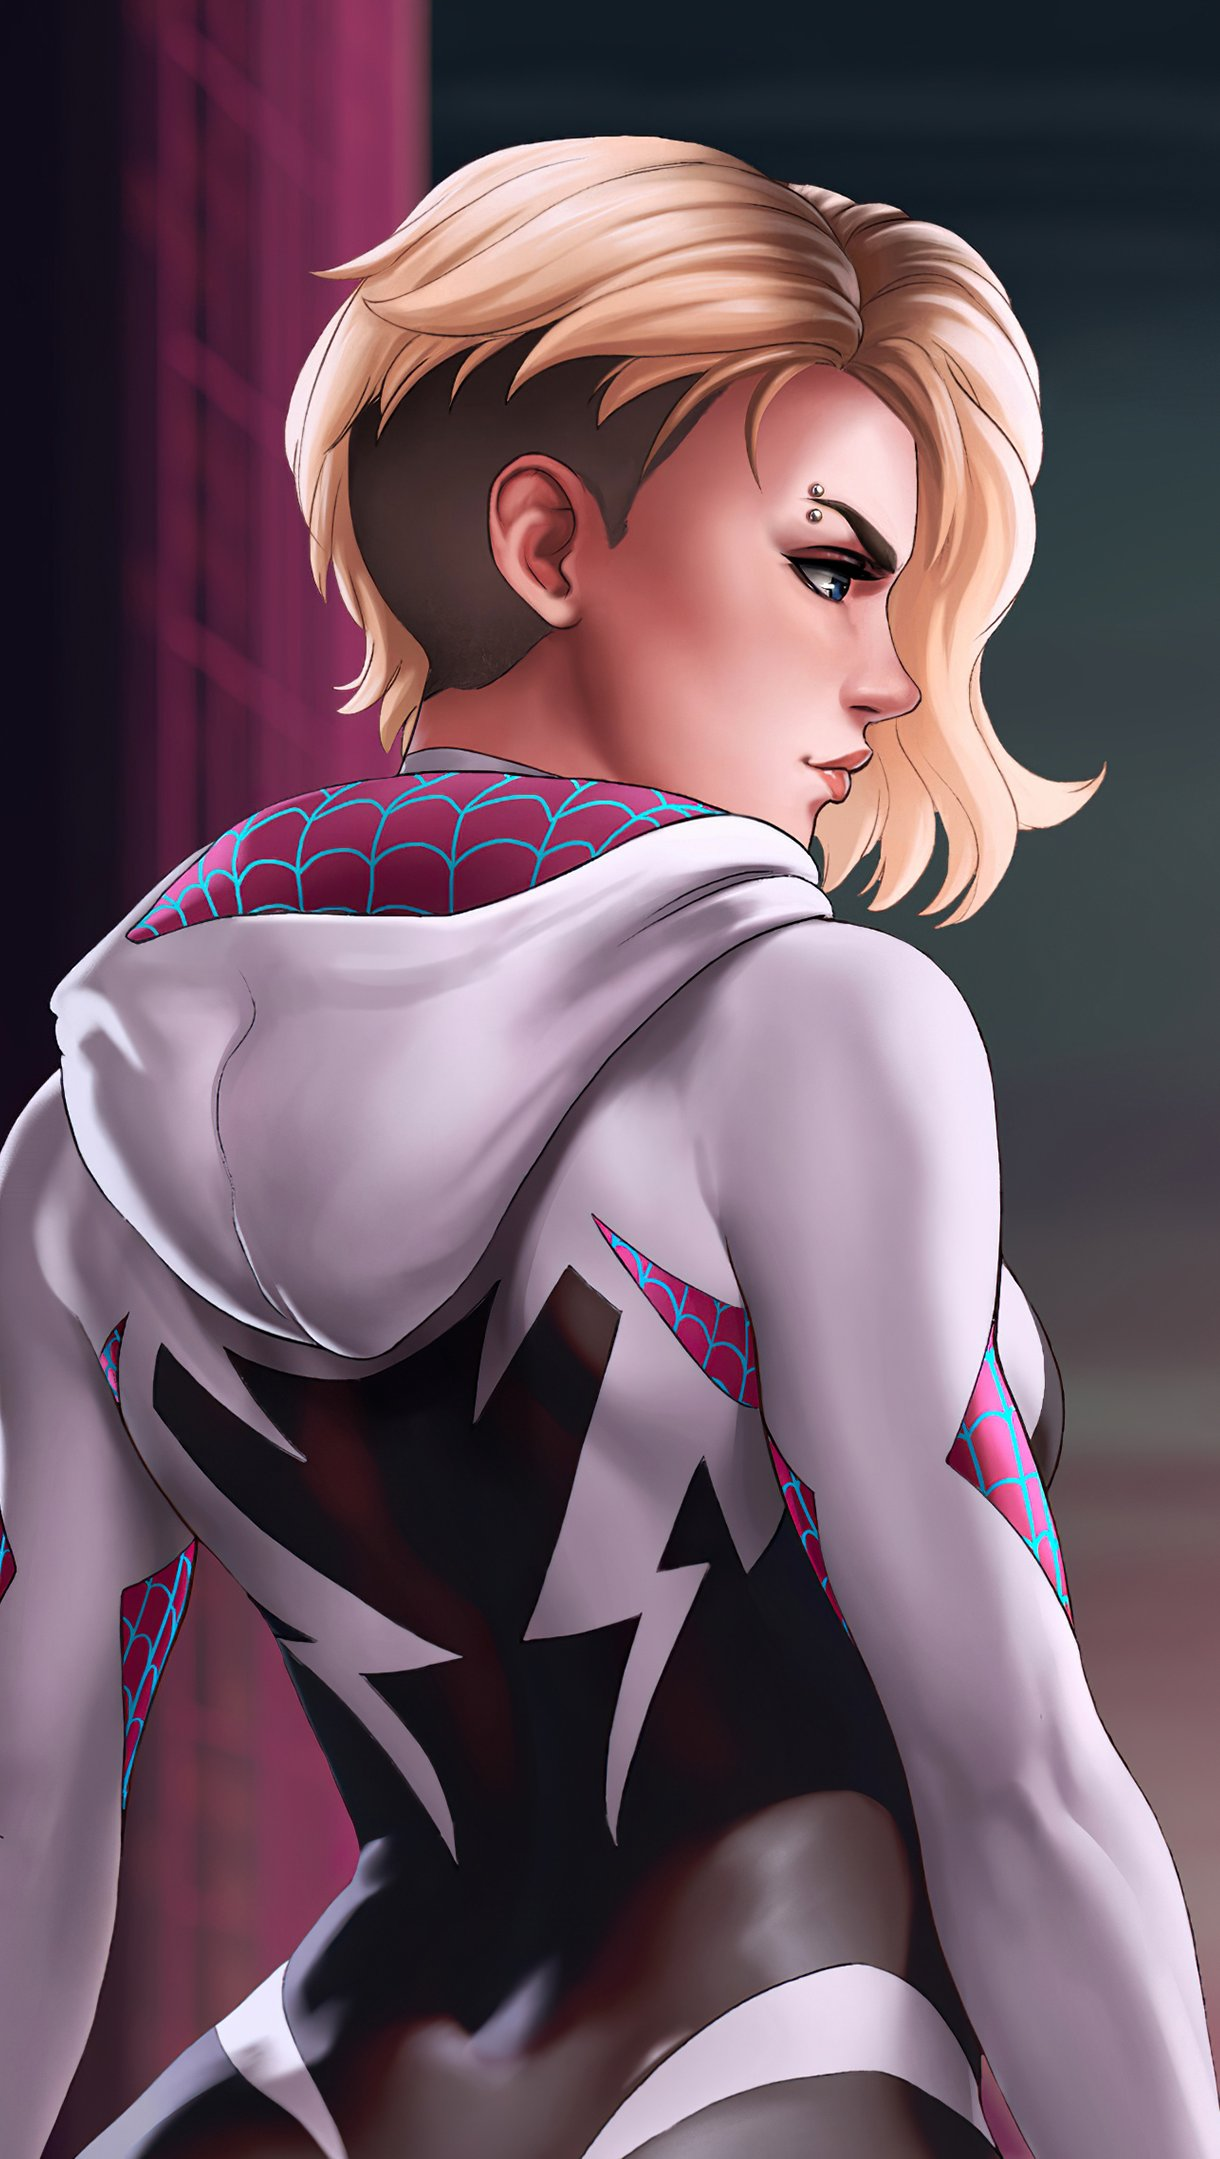 Wallpaper Spider Gwen Marvel Art Vertical